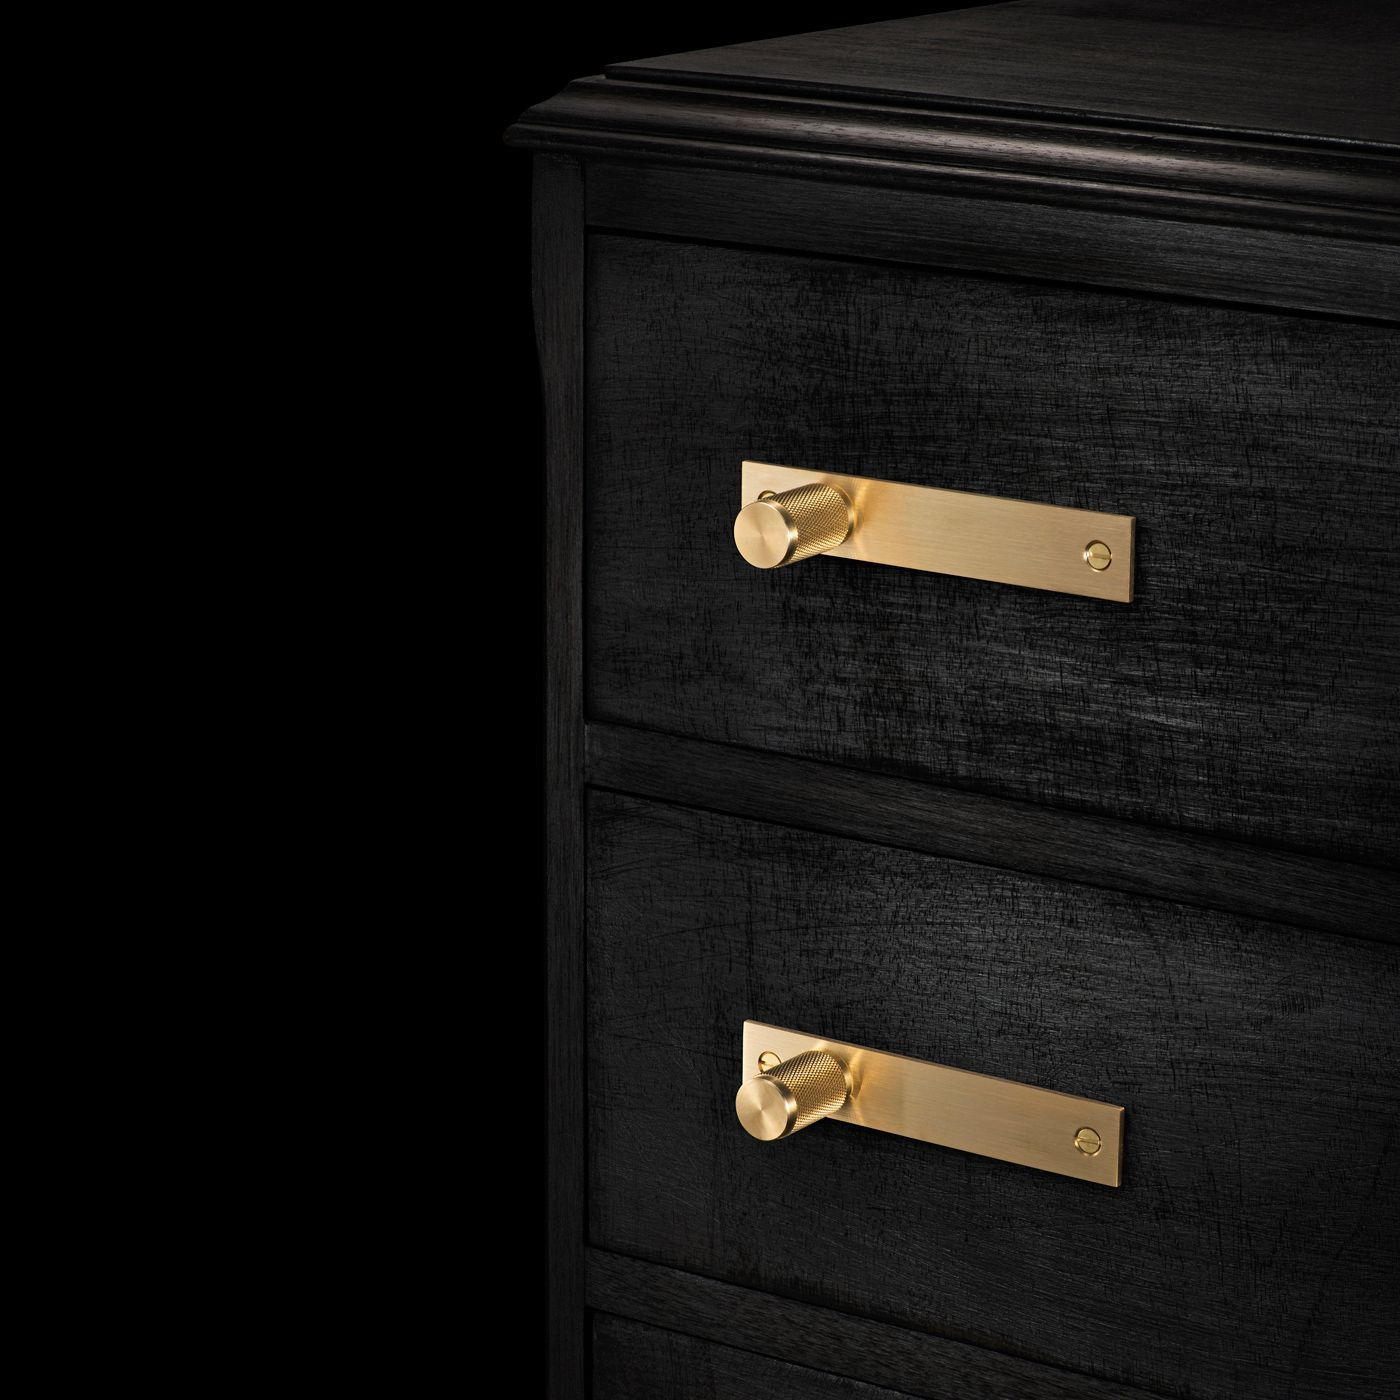 Staggering diy ideas homemade rustic furniture home furniture